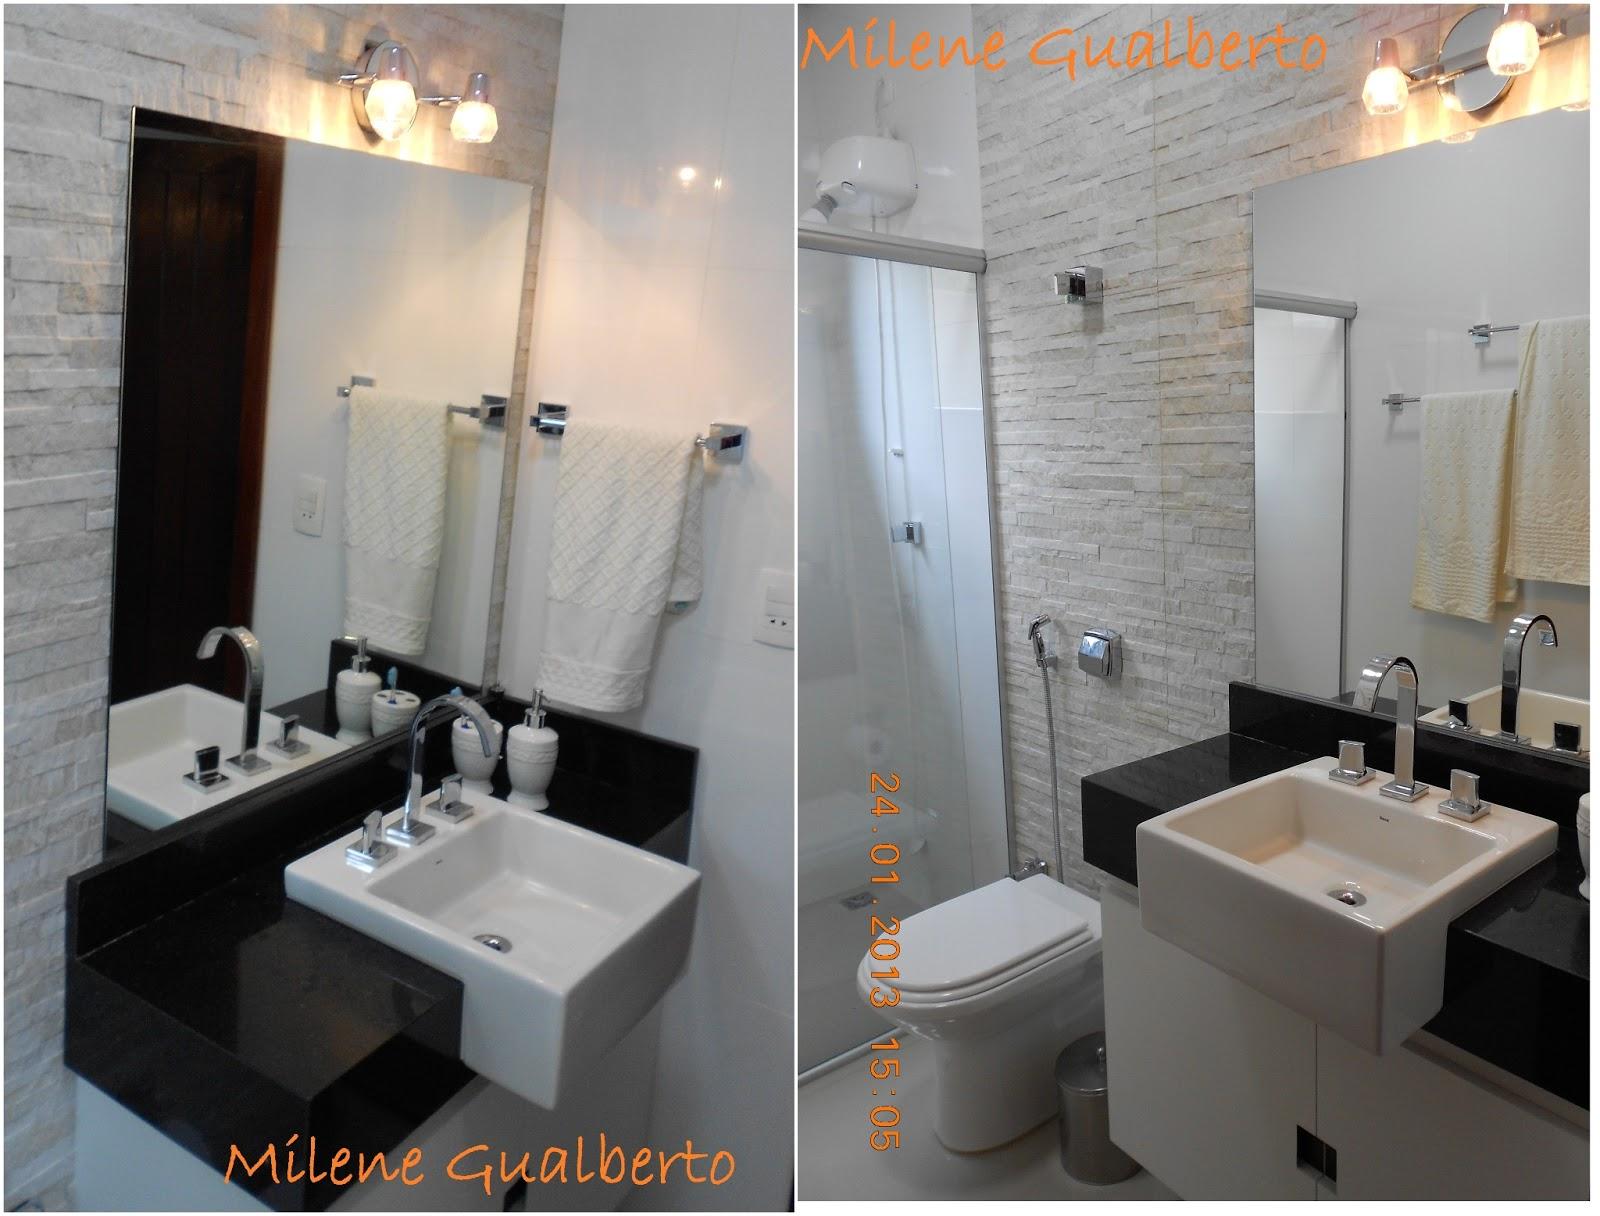 #A15C2A Milene Gualberto: Fevereiro 2013 1600x1216 px Banheiros De Granito Preto 1323